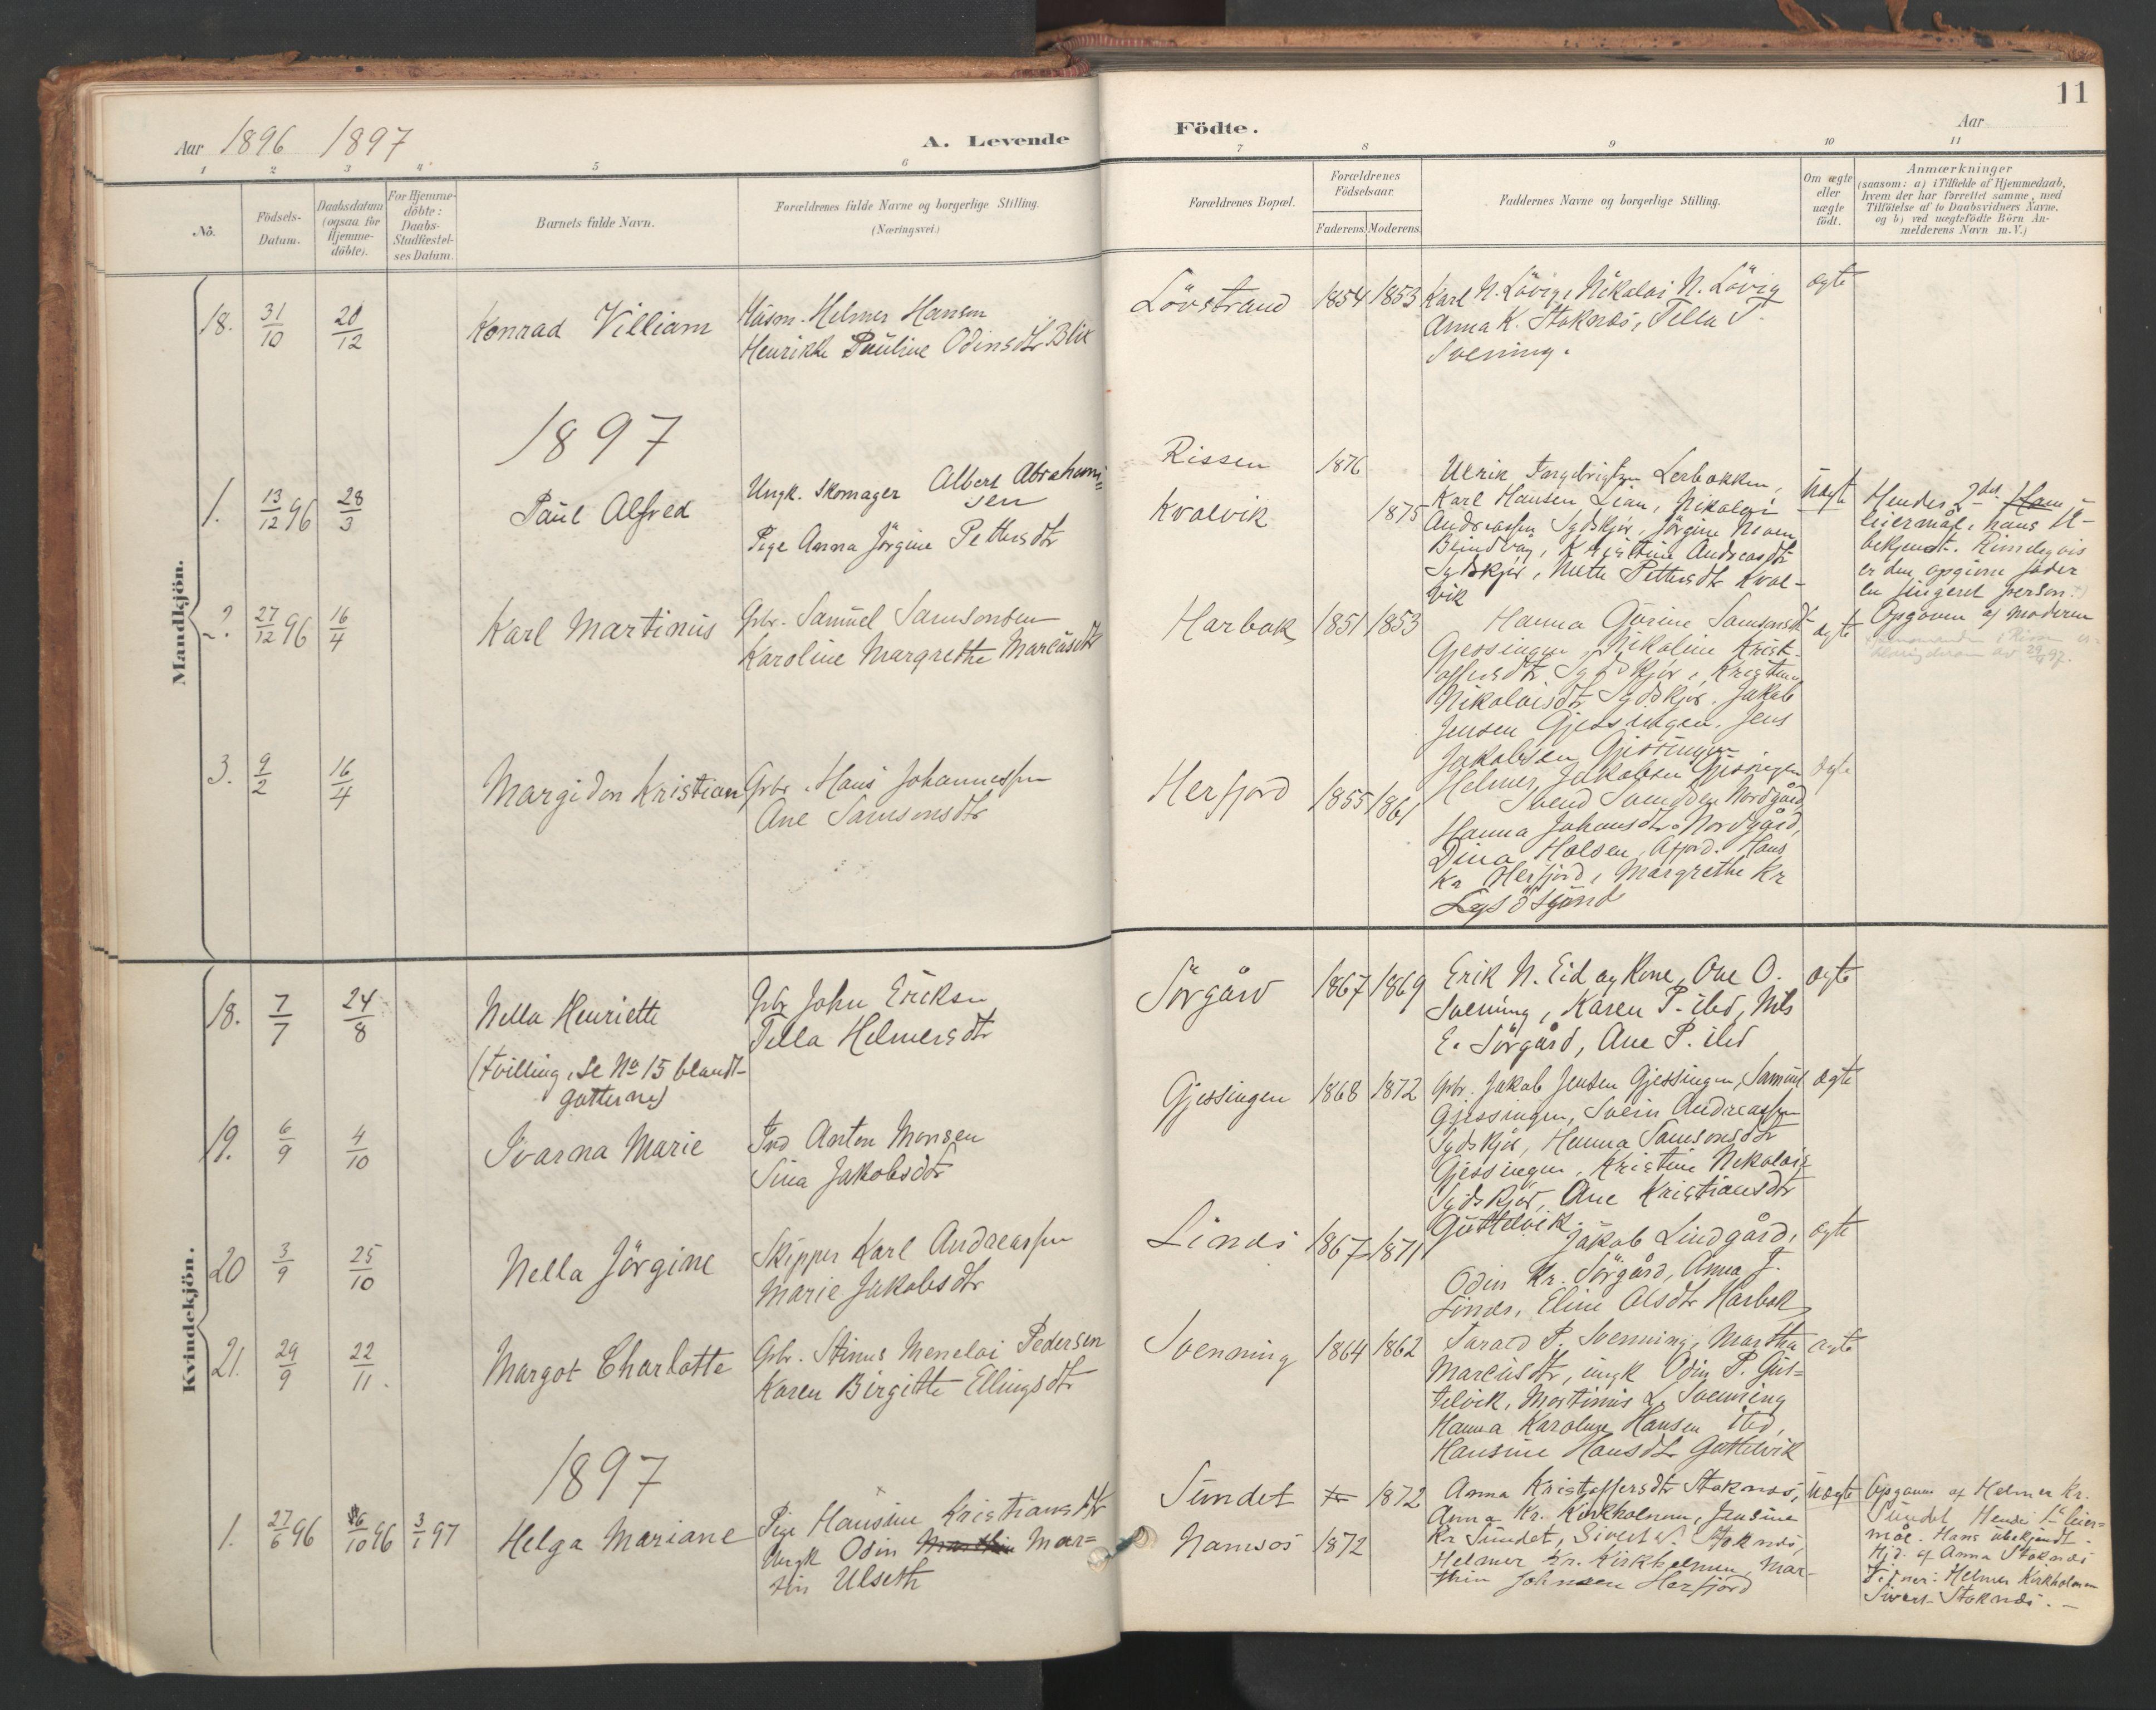 SAT, Ministerialprotokoller, klokkerbøker og fødselsregistre - Sør-Trøndelag, 656/L0693: Parish register (official) no. 656A02, 1894-1913, p. 11